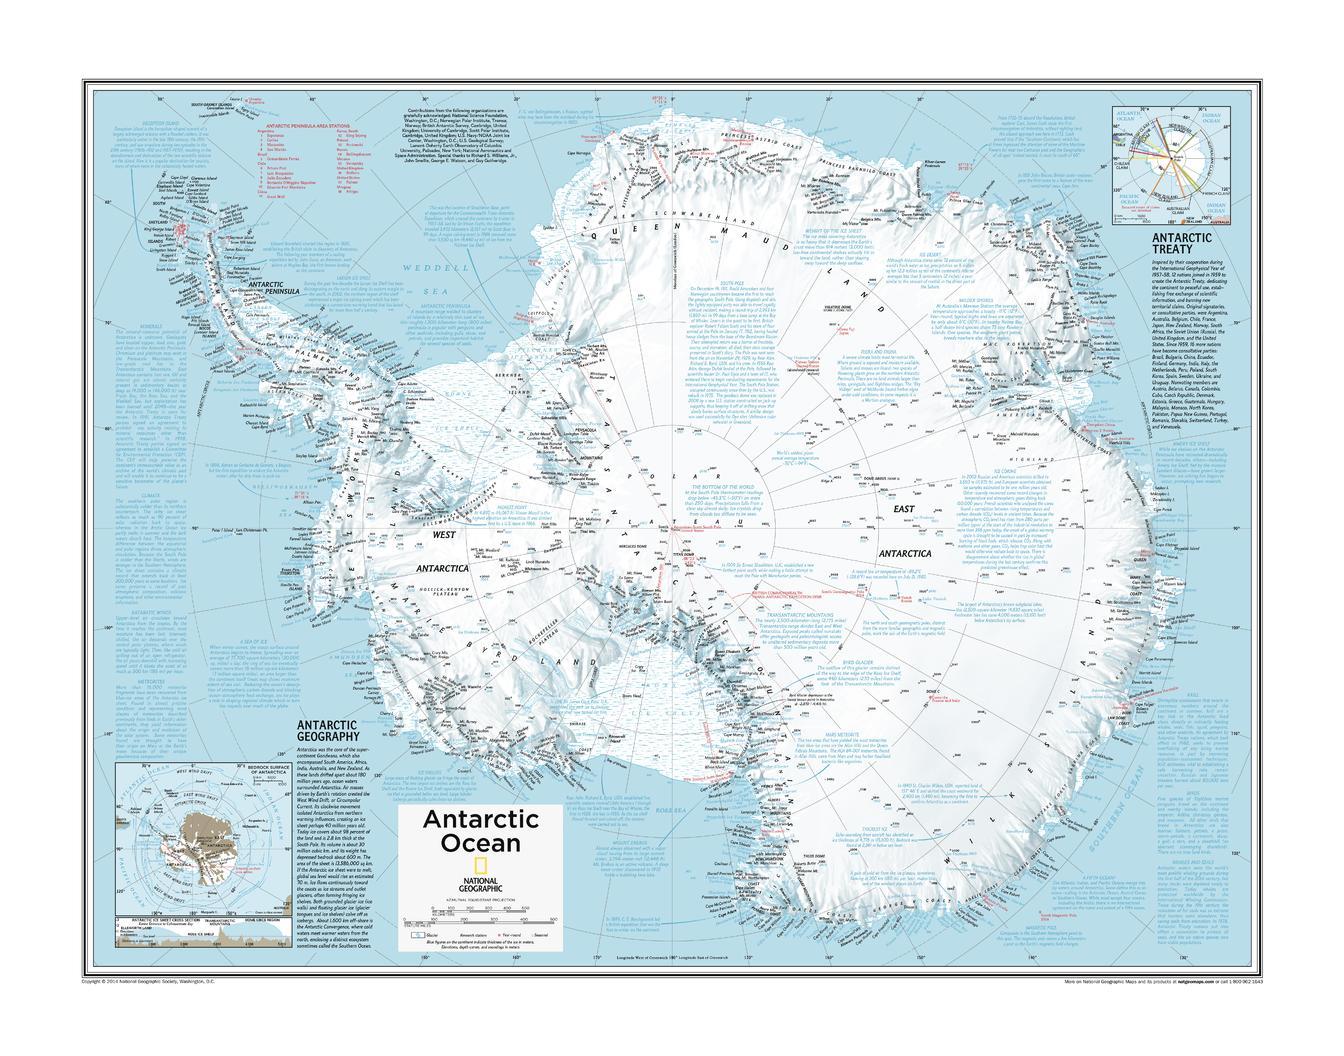 Antarctica Political - Atlas of the World, 10th Edition